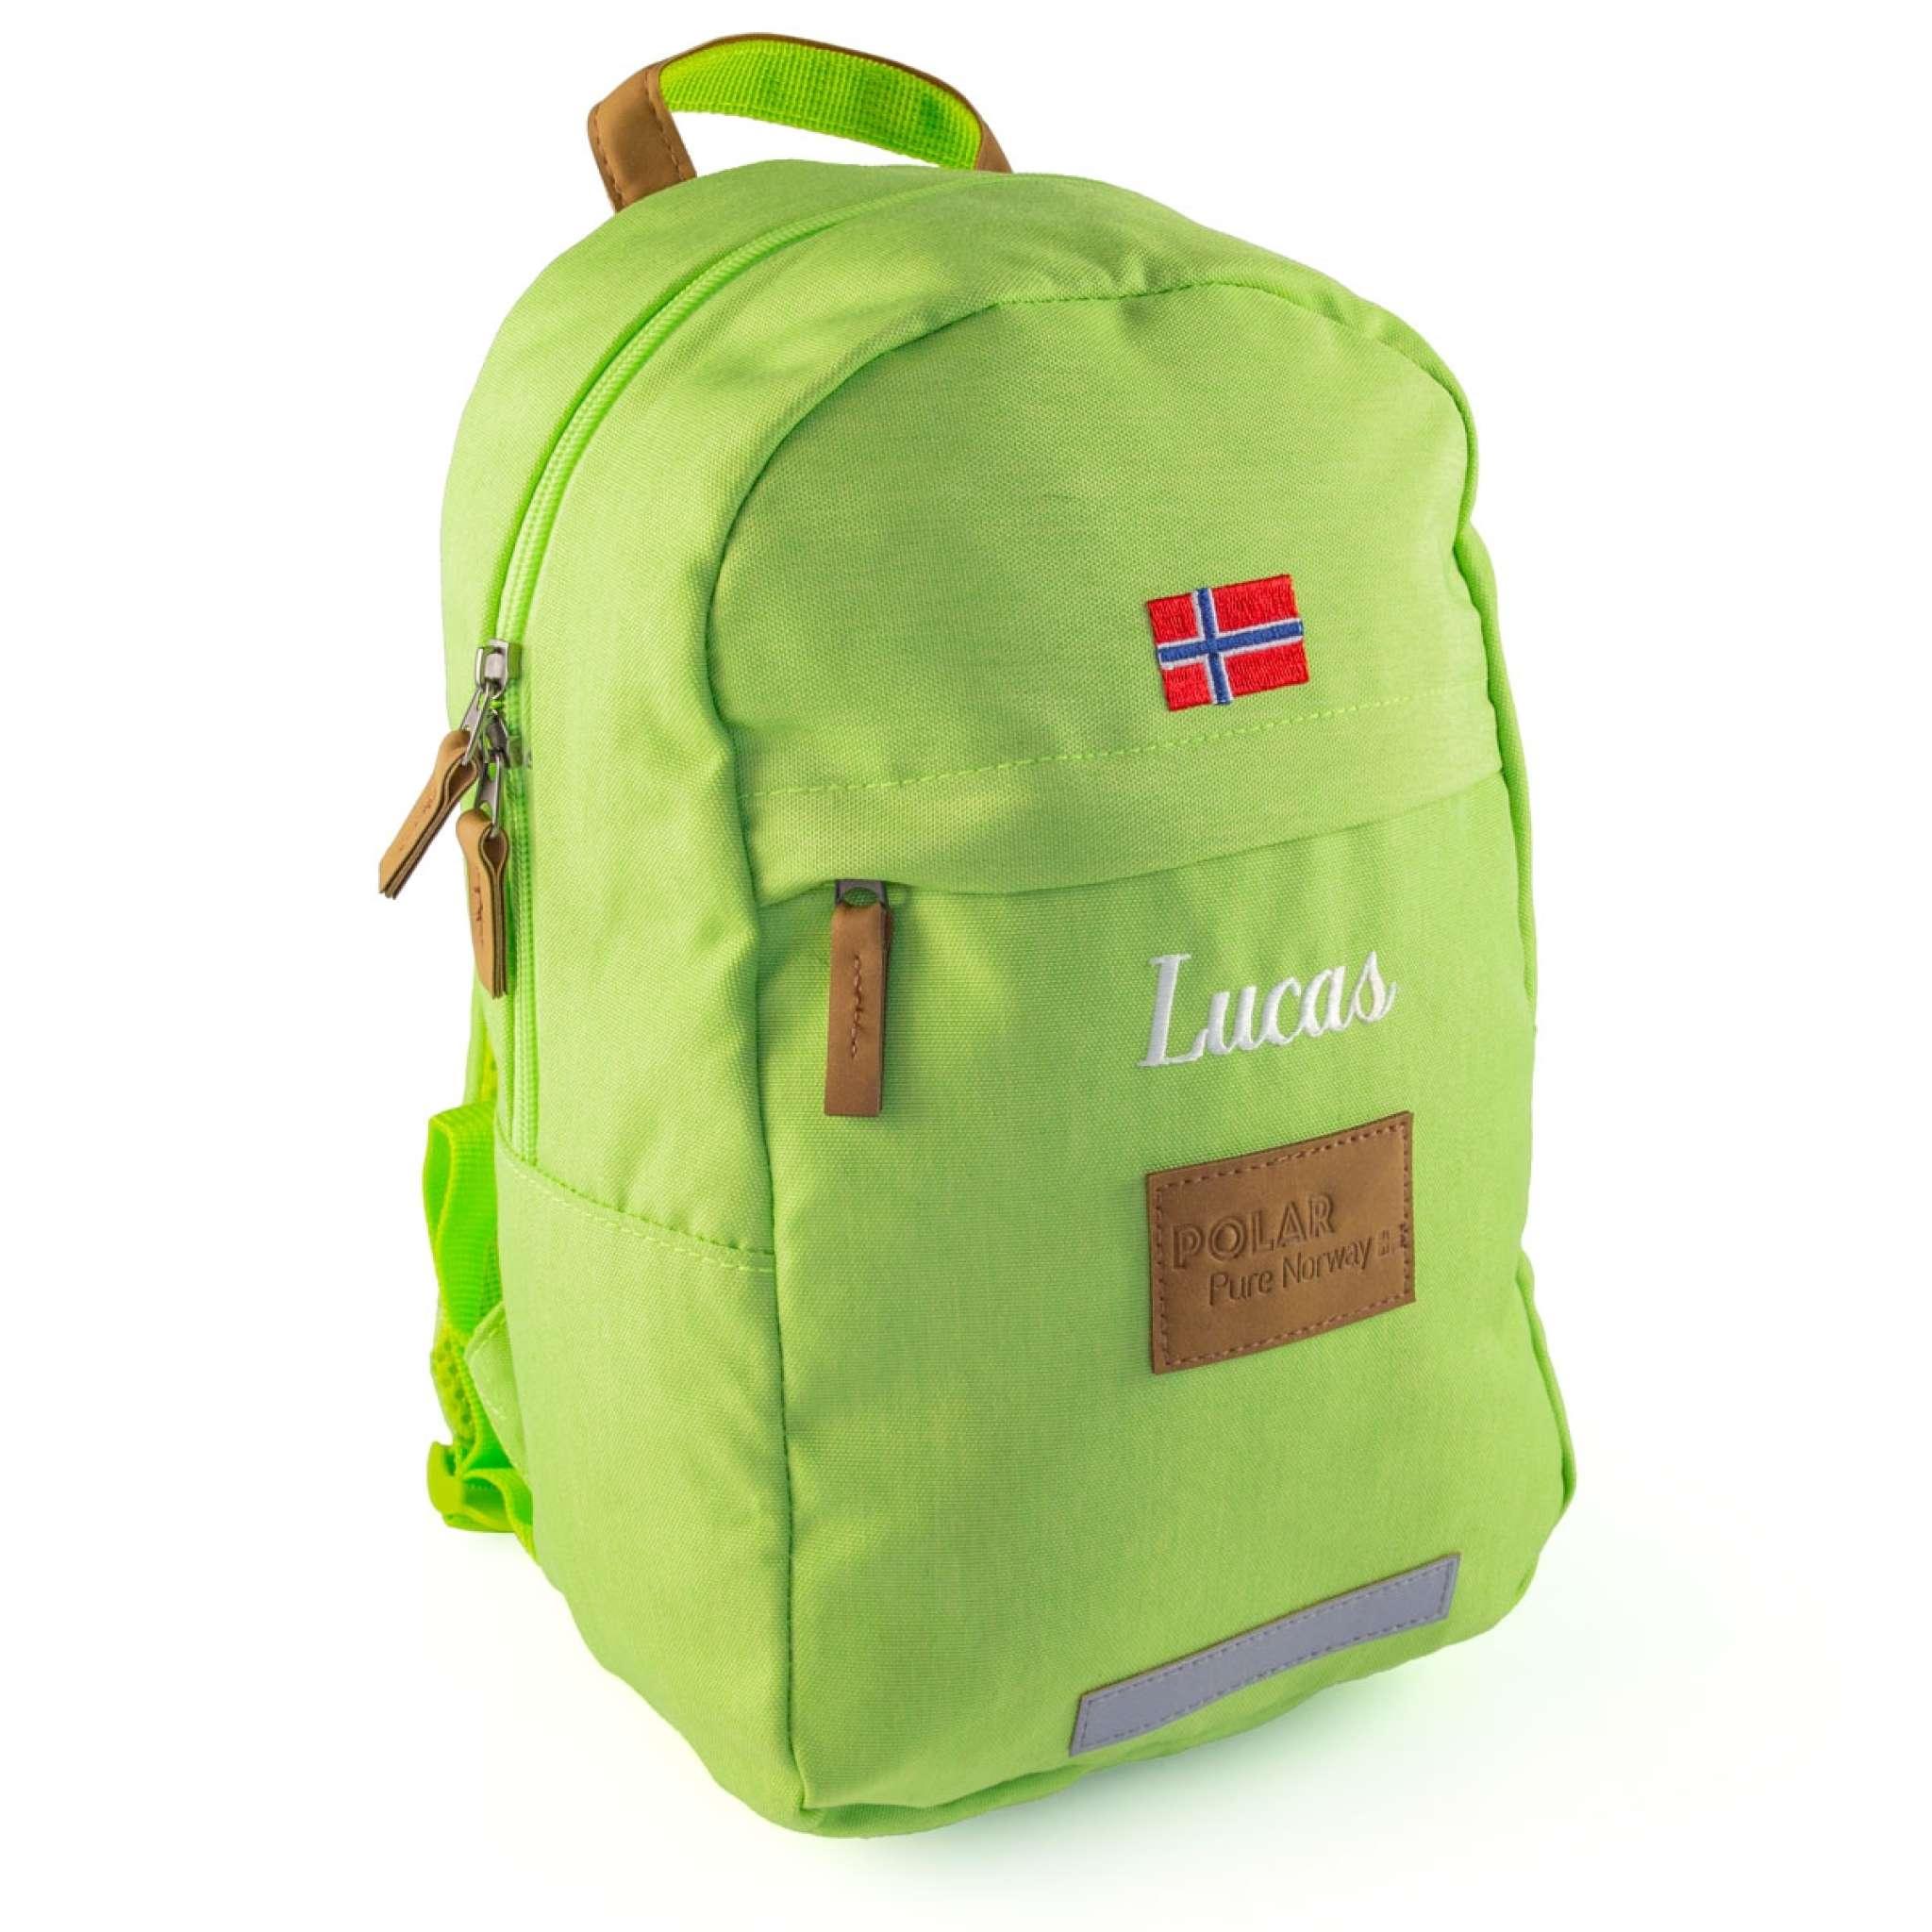 Guldbonus: Polar Pure Norway ryggsäck 10 liter